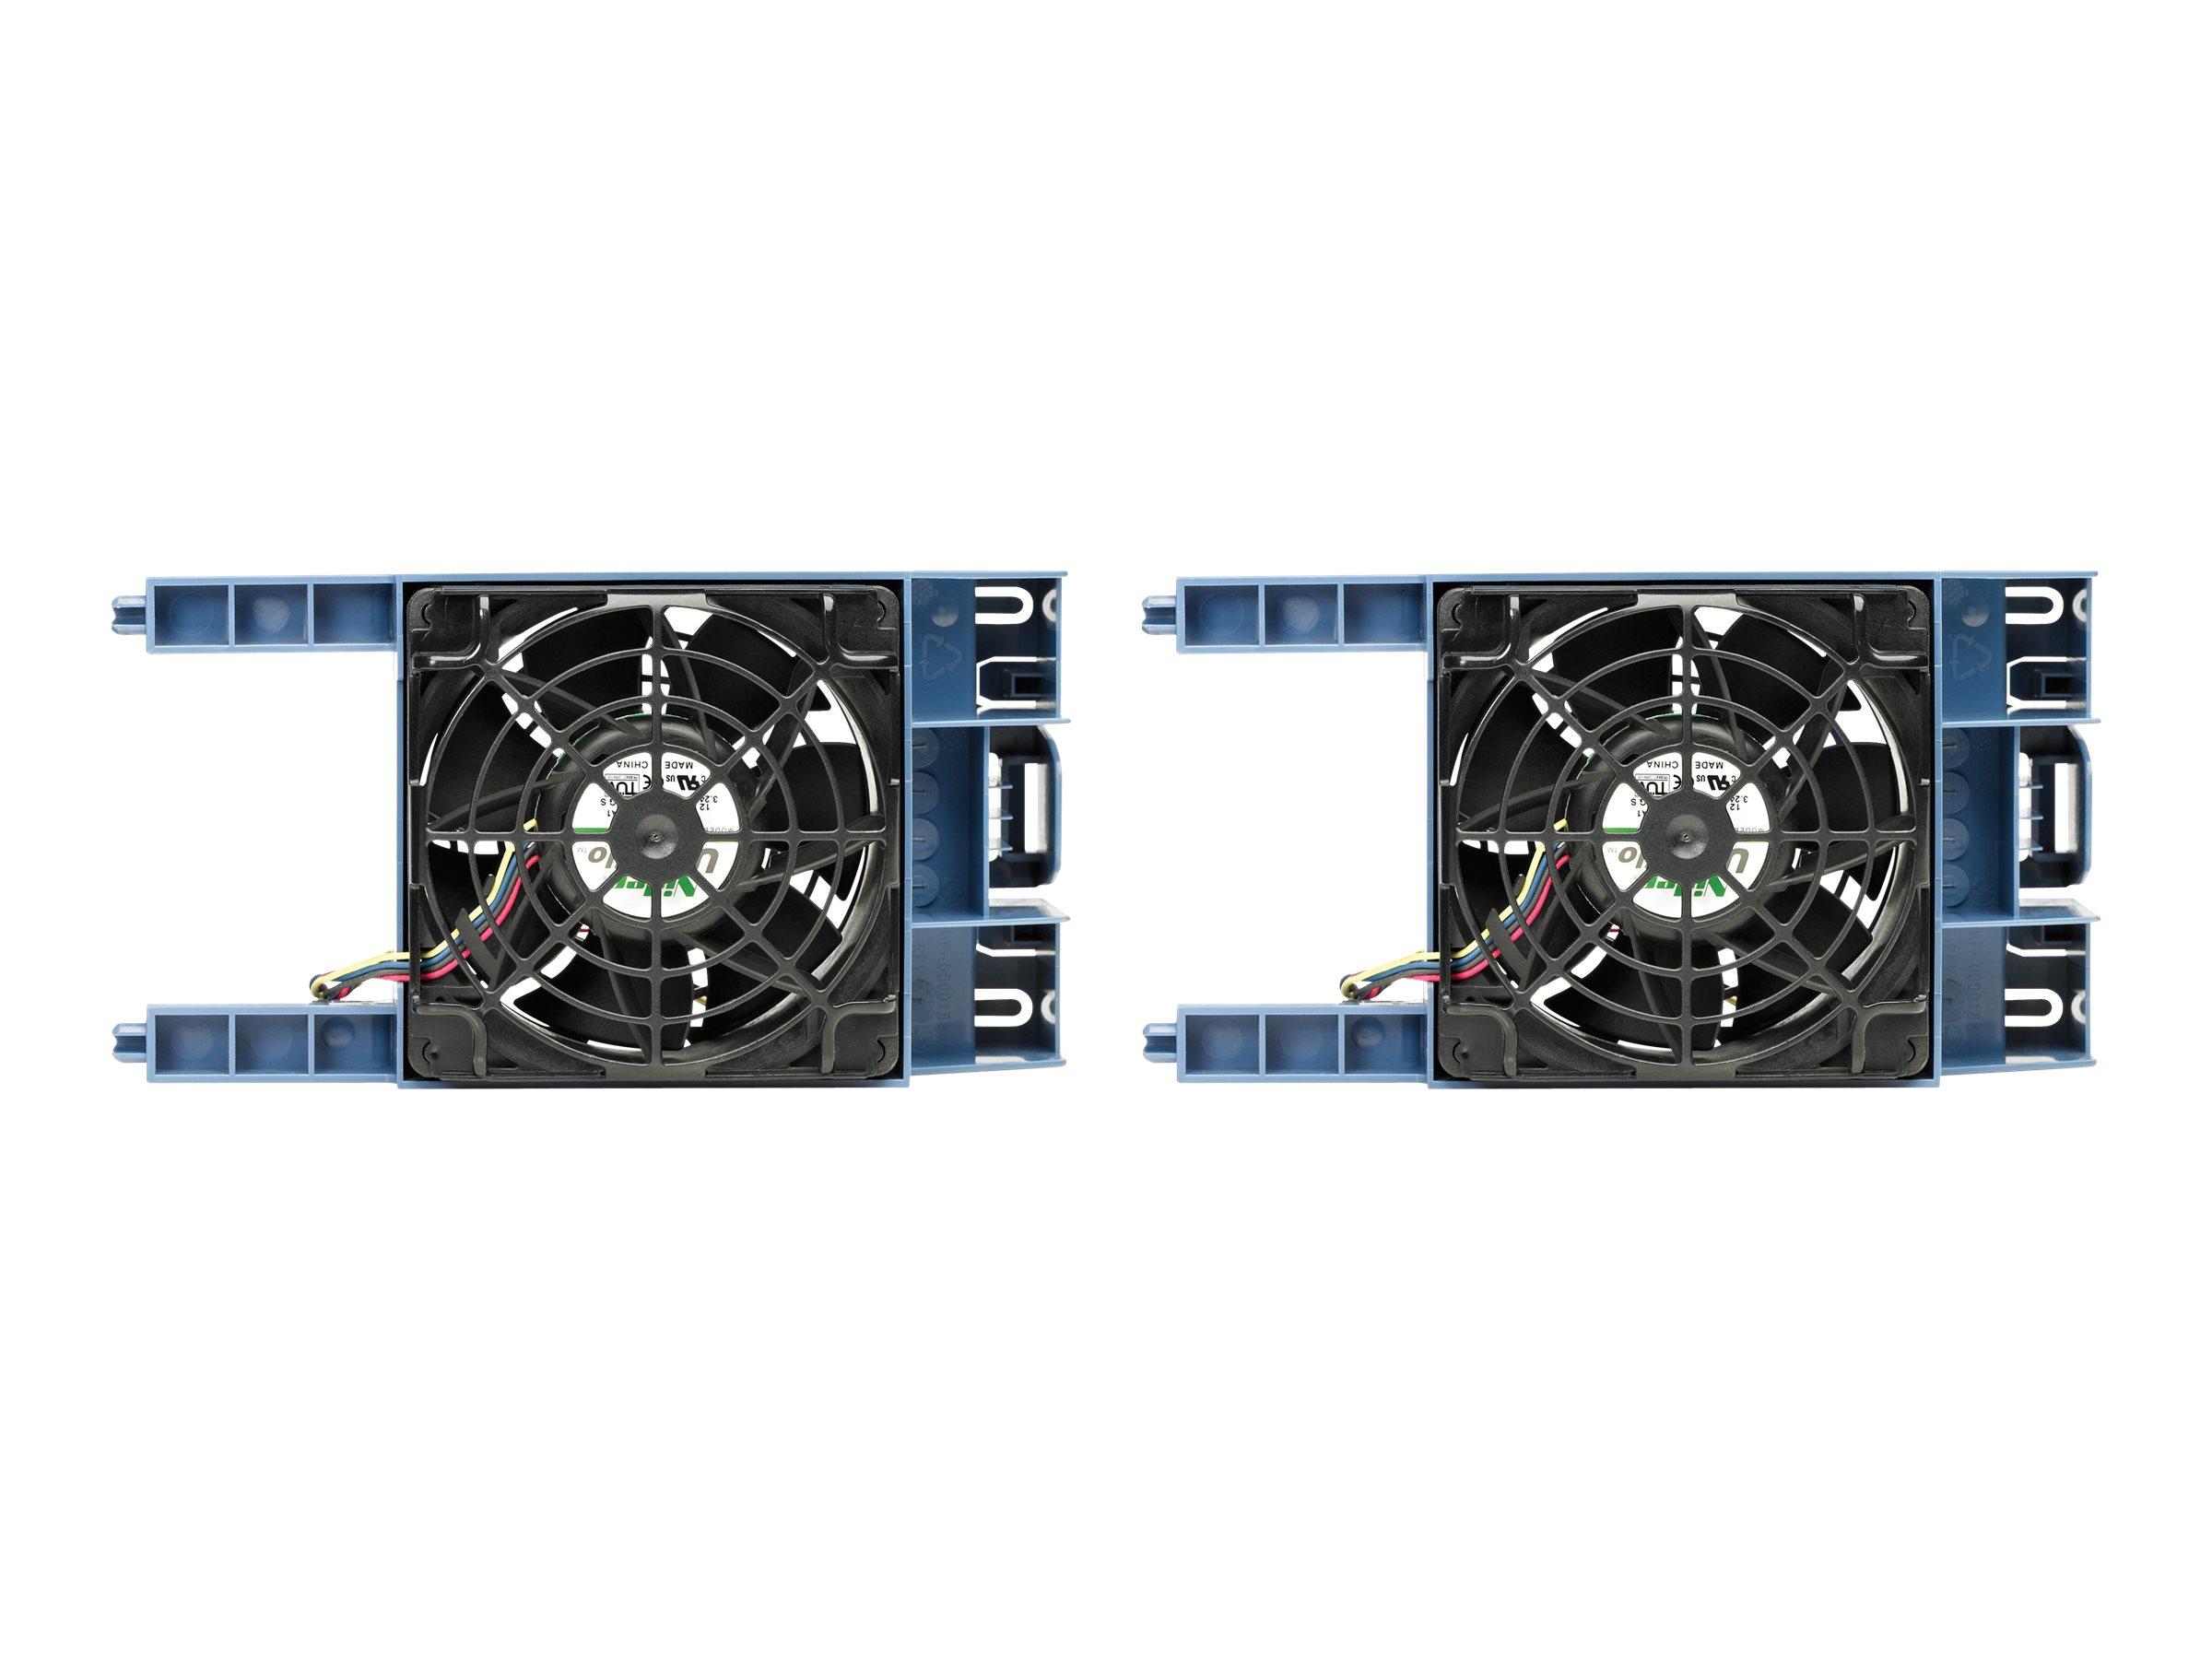 Hpe maximum performance fan kit system geblaeseeinheit fuer nimble storage dhci medium solution with hpe proliant dl325 gen10 proliant dl325 gen10 15232884 p37110 b21